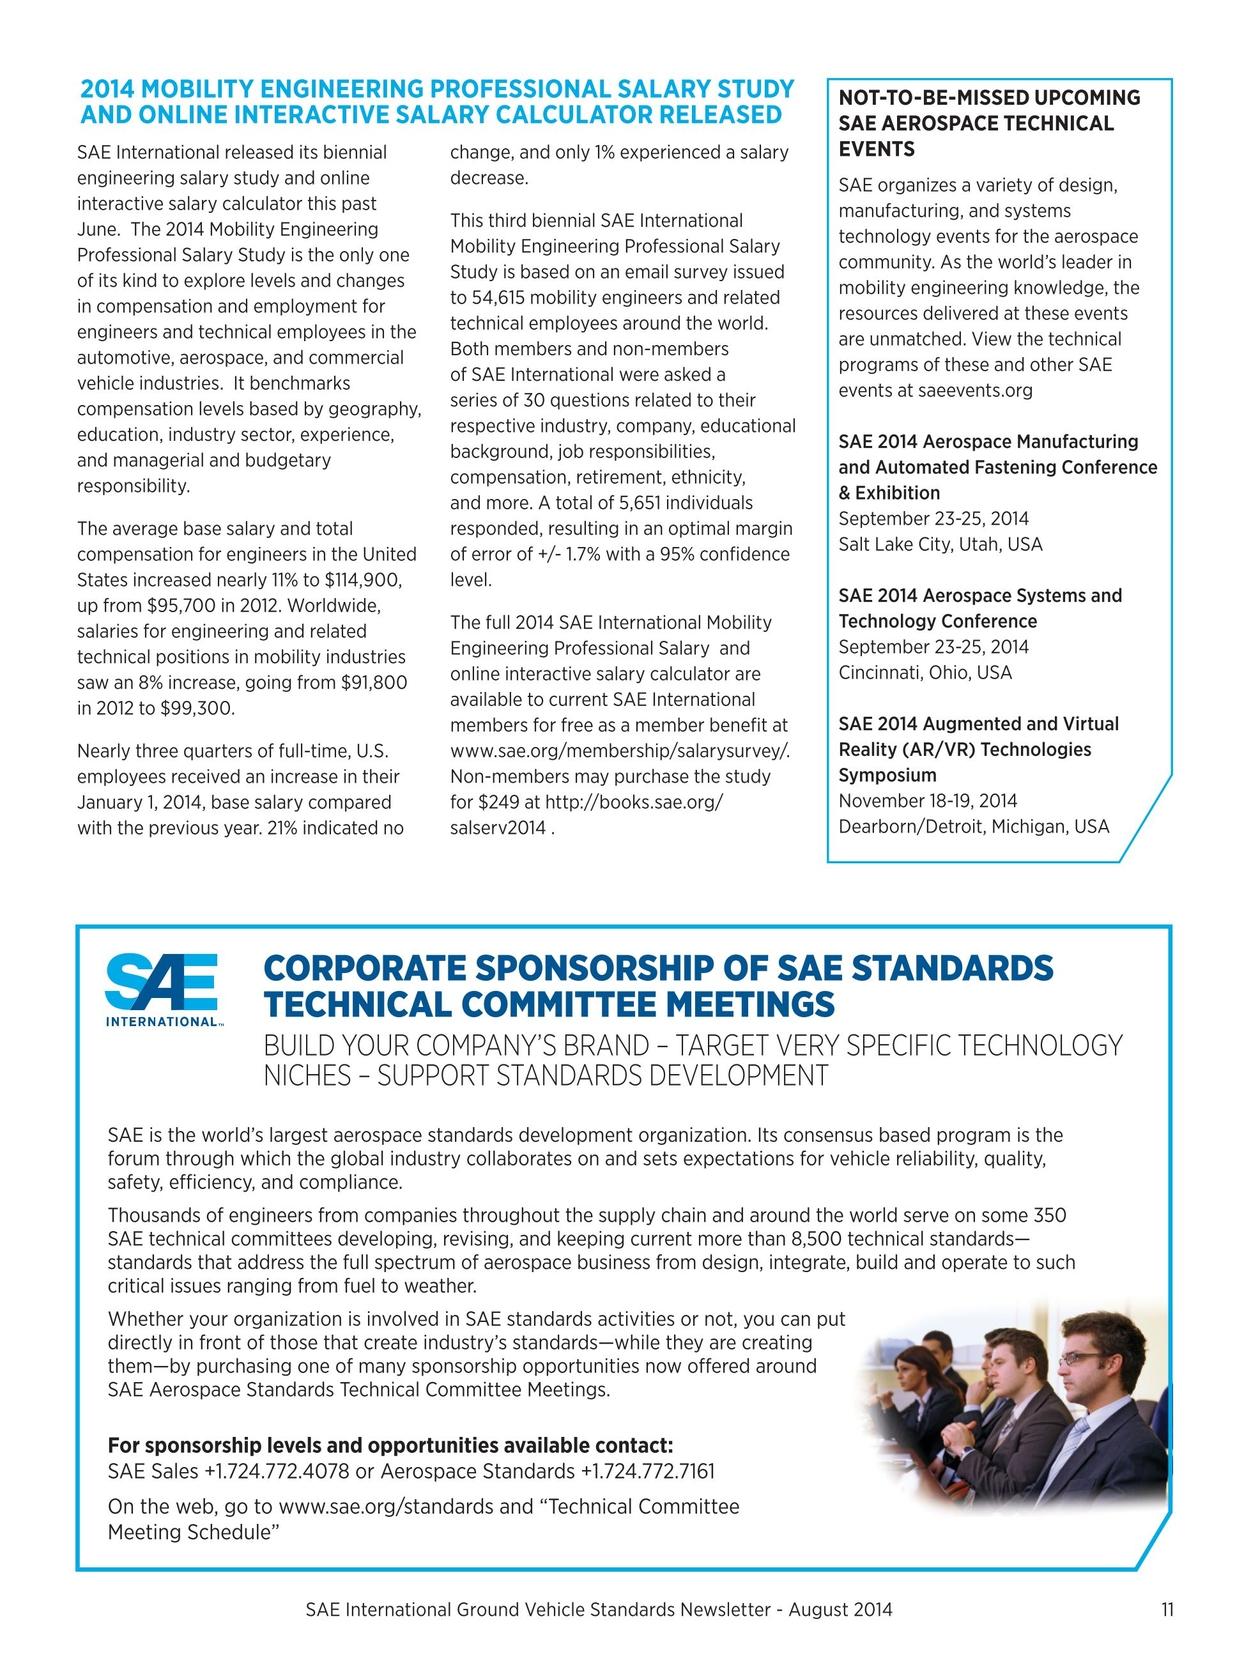 Aerospace Standards Newsletter - August 2014